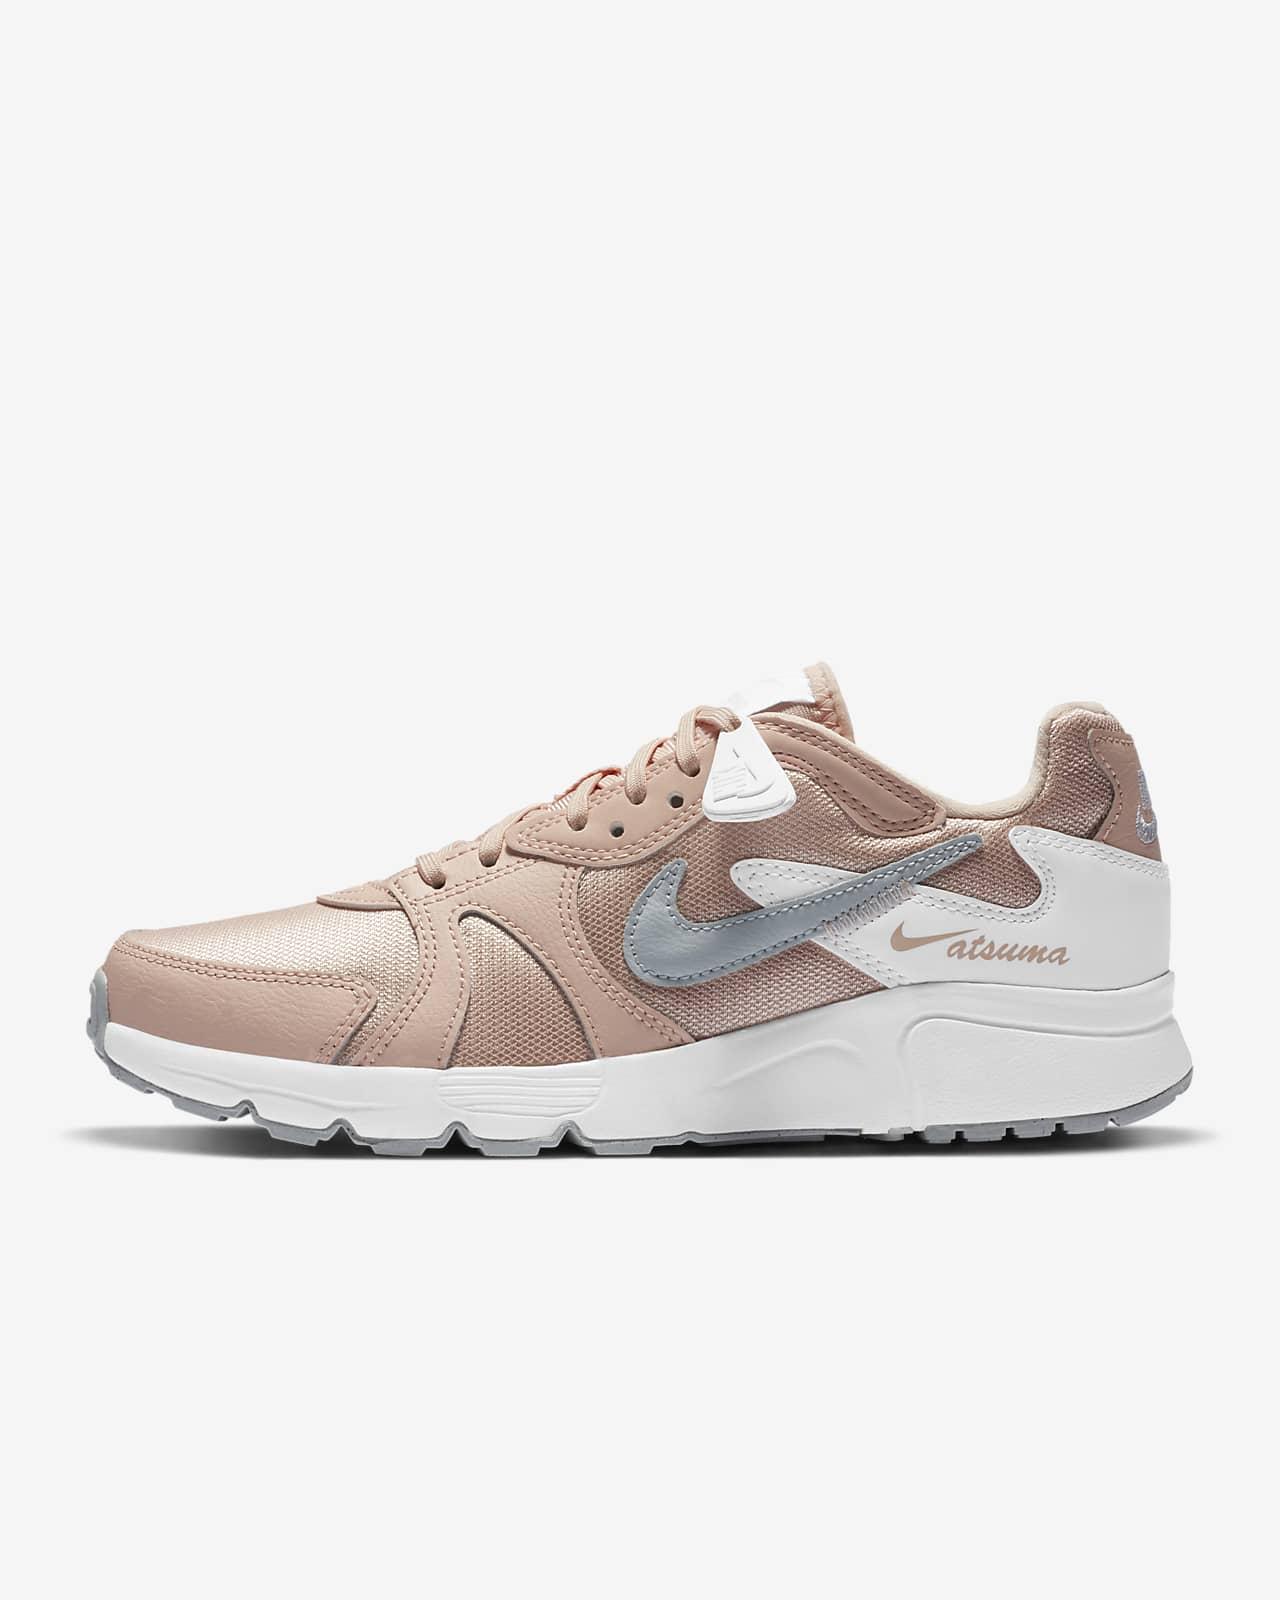 Dámská bota Nike Atsuma